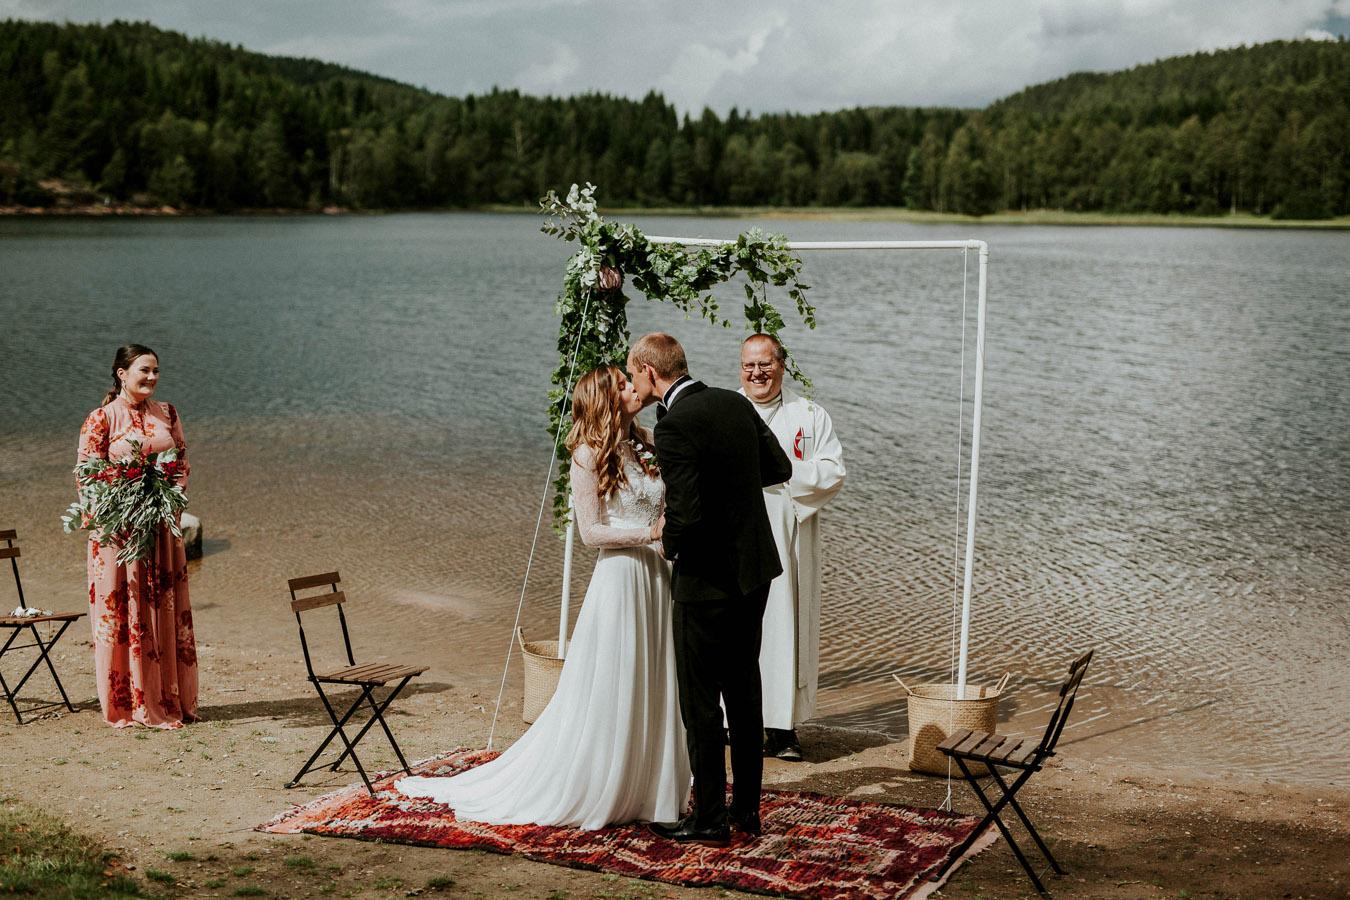 Fotograf-Tone-Tvedt-bryllup-135.jpg